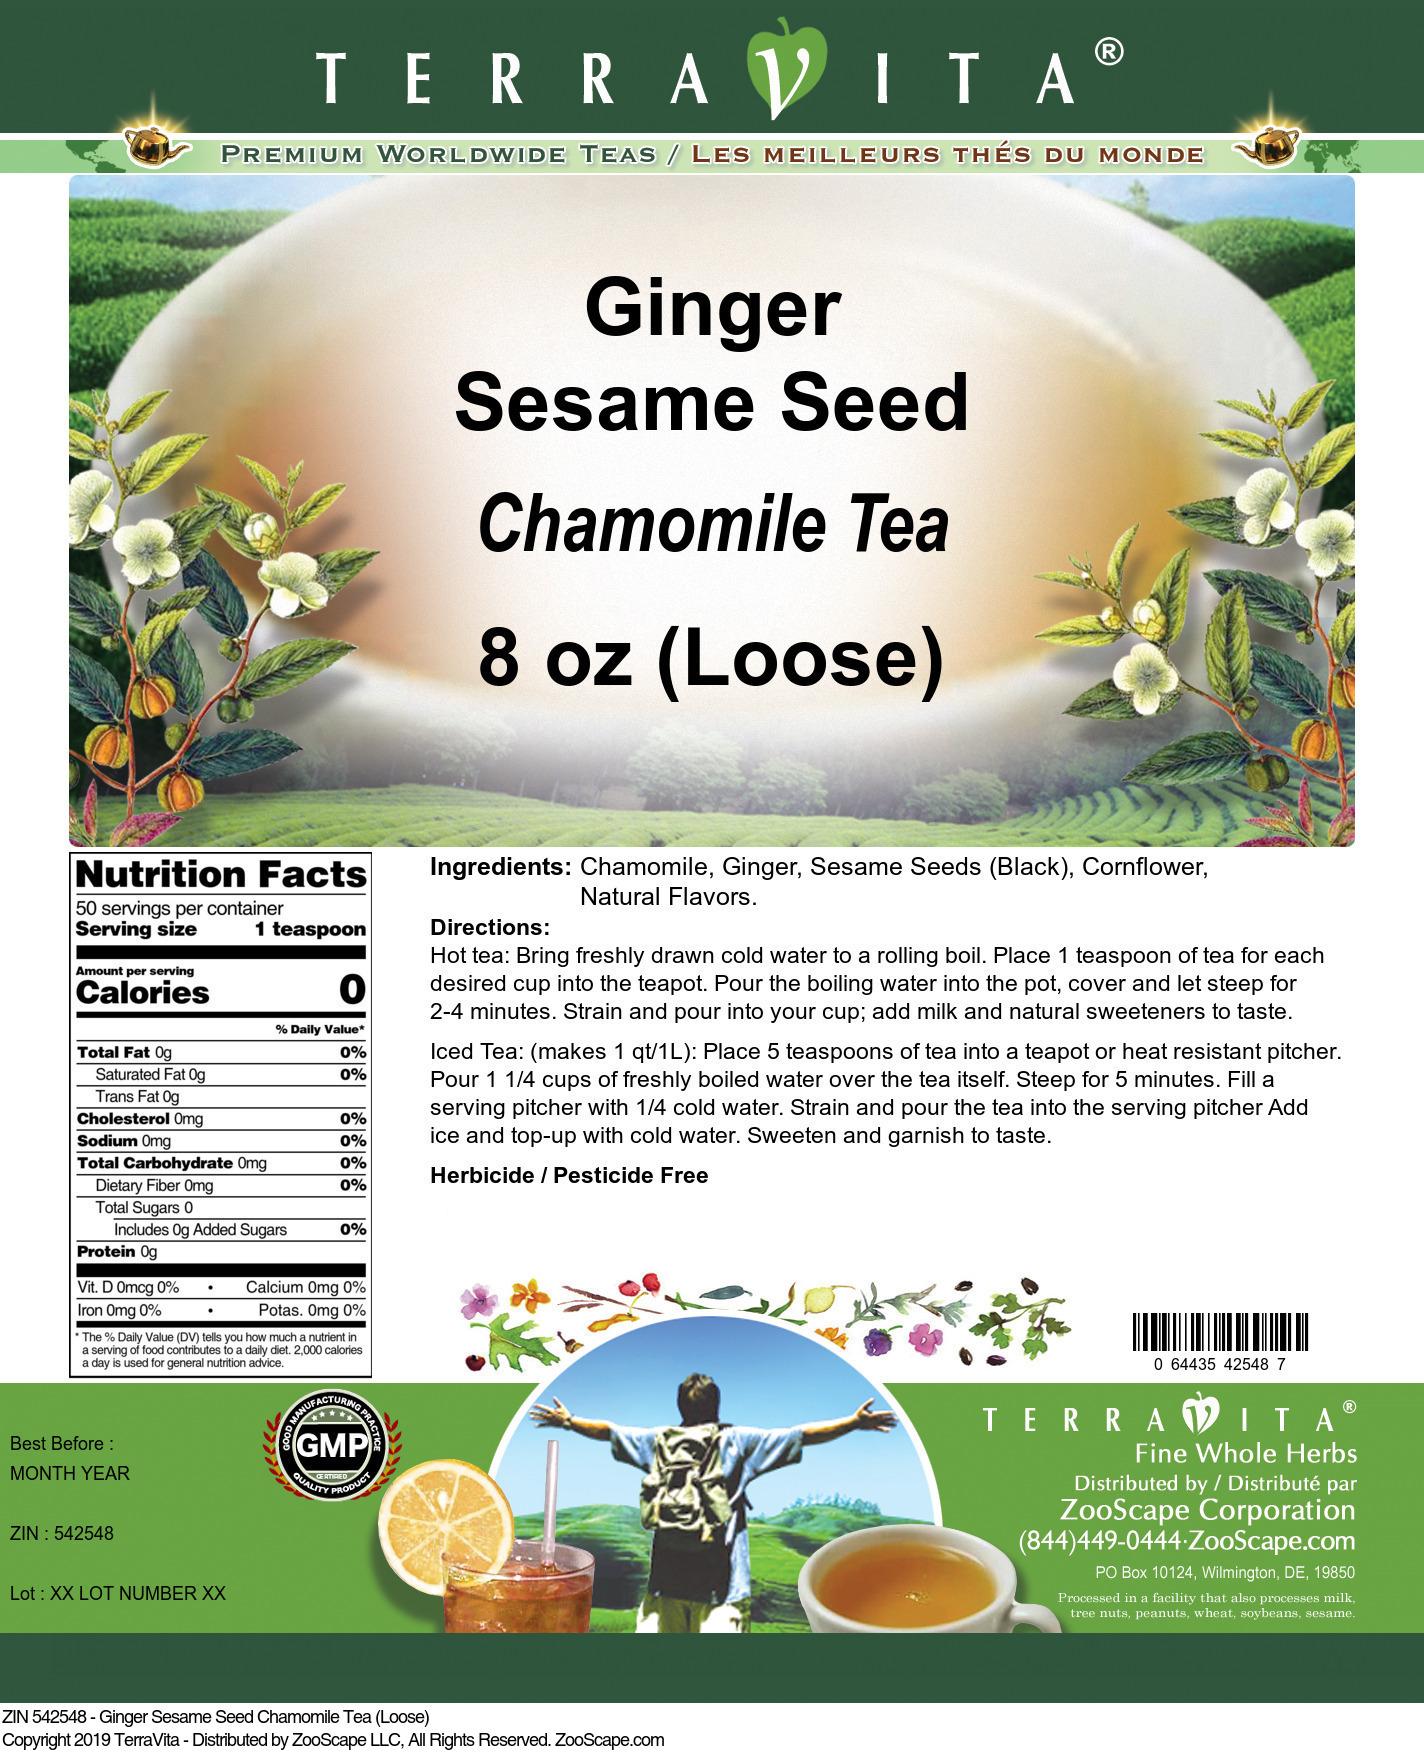 Ginger Sesame Seed Chamomile Tea (Loose)